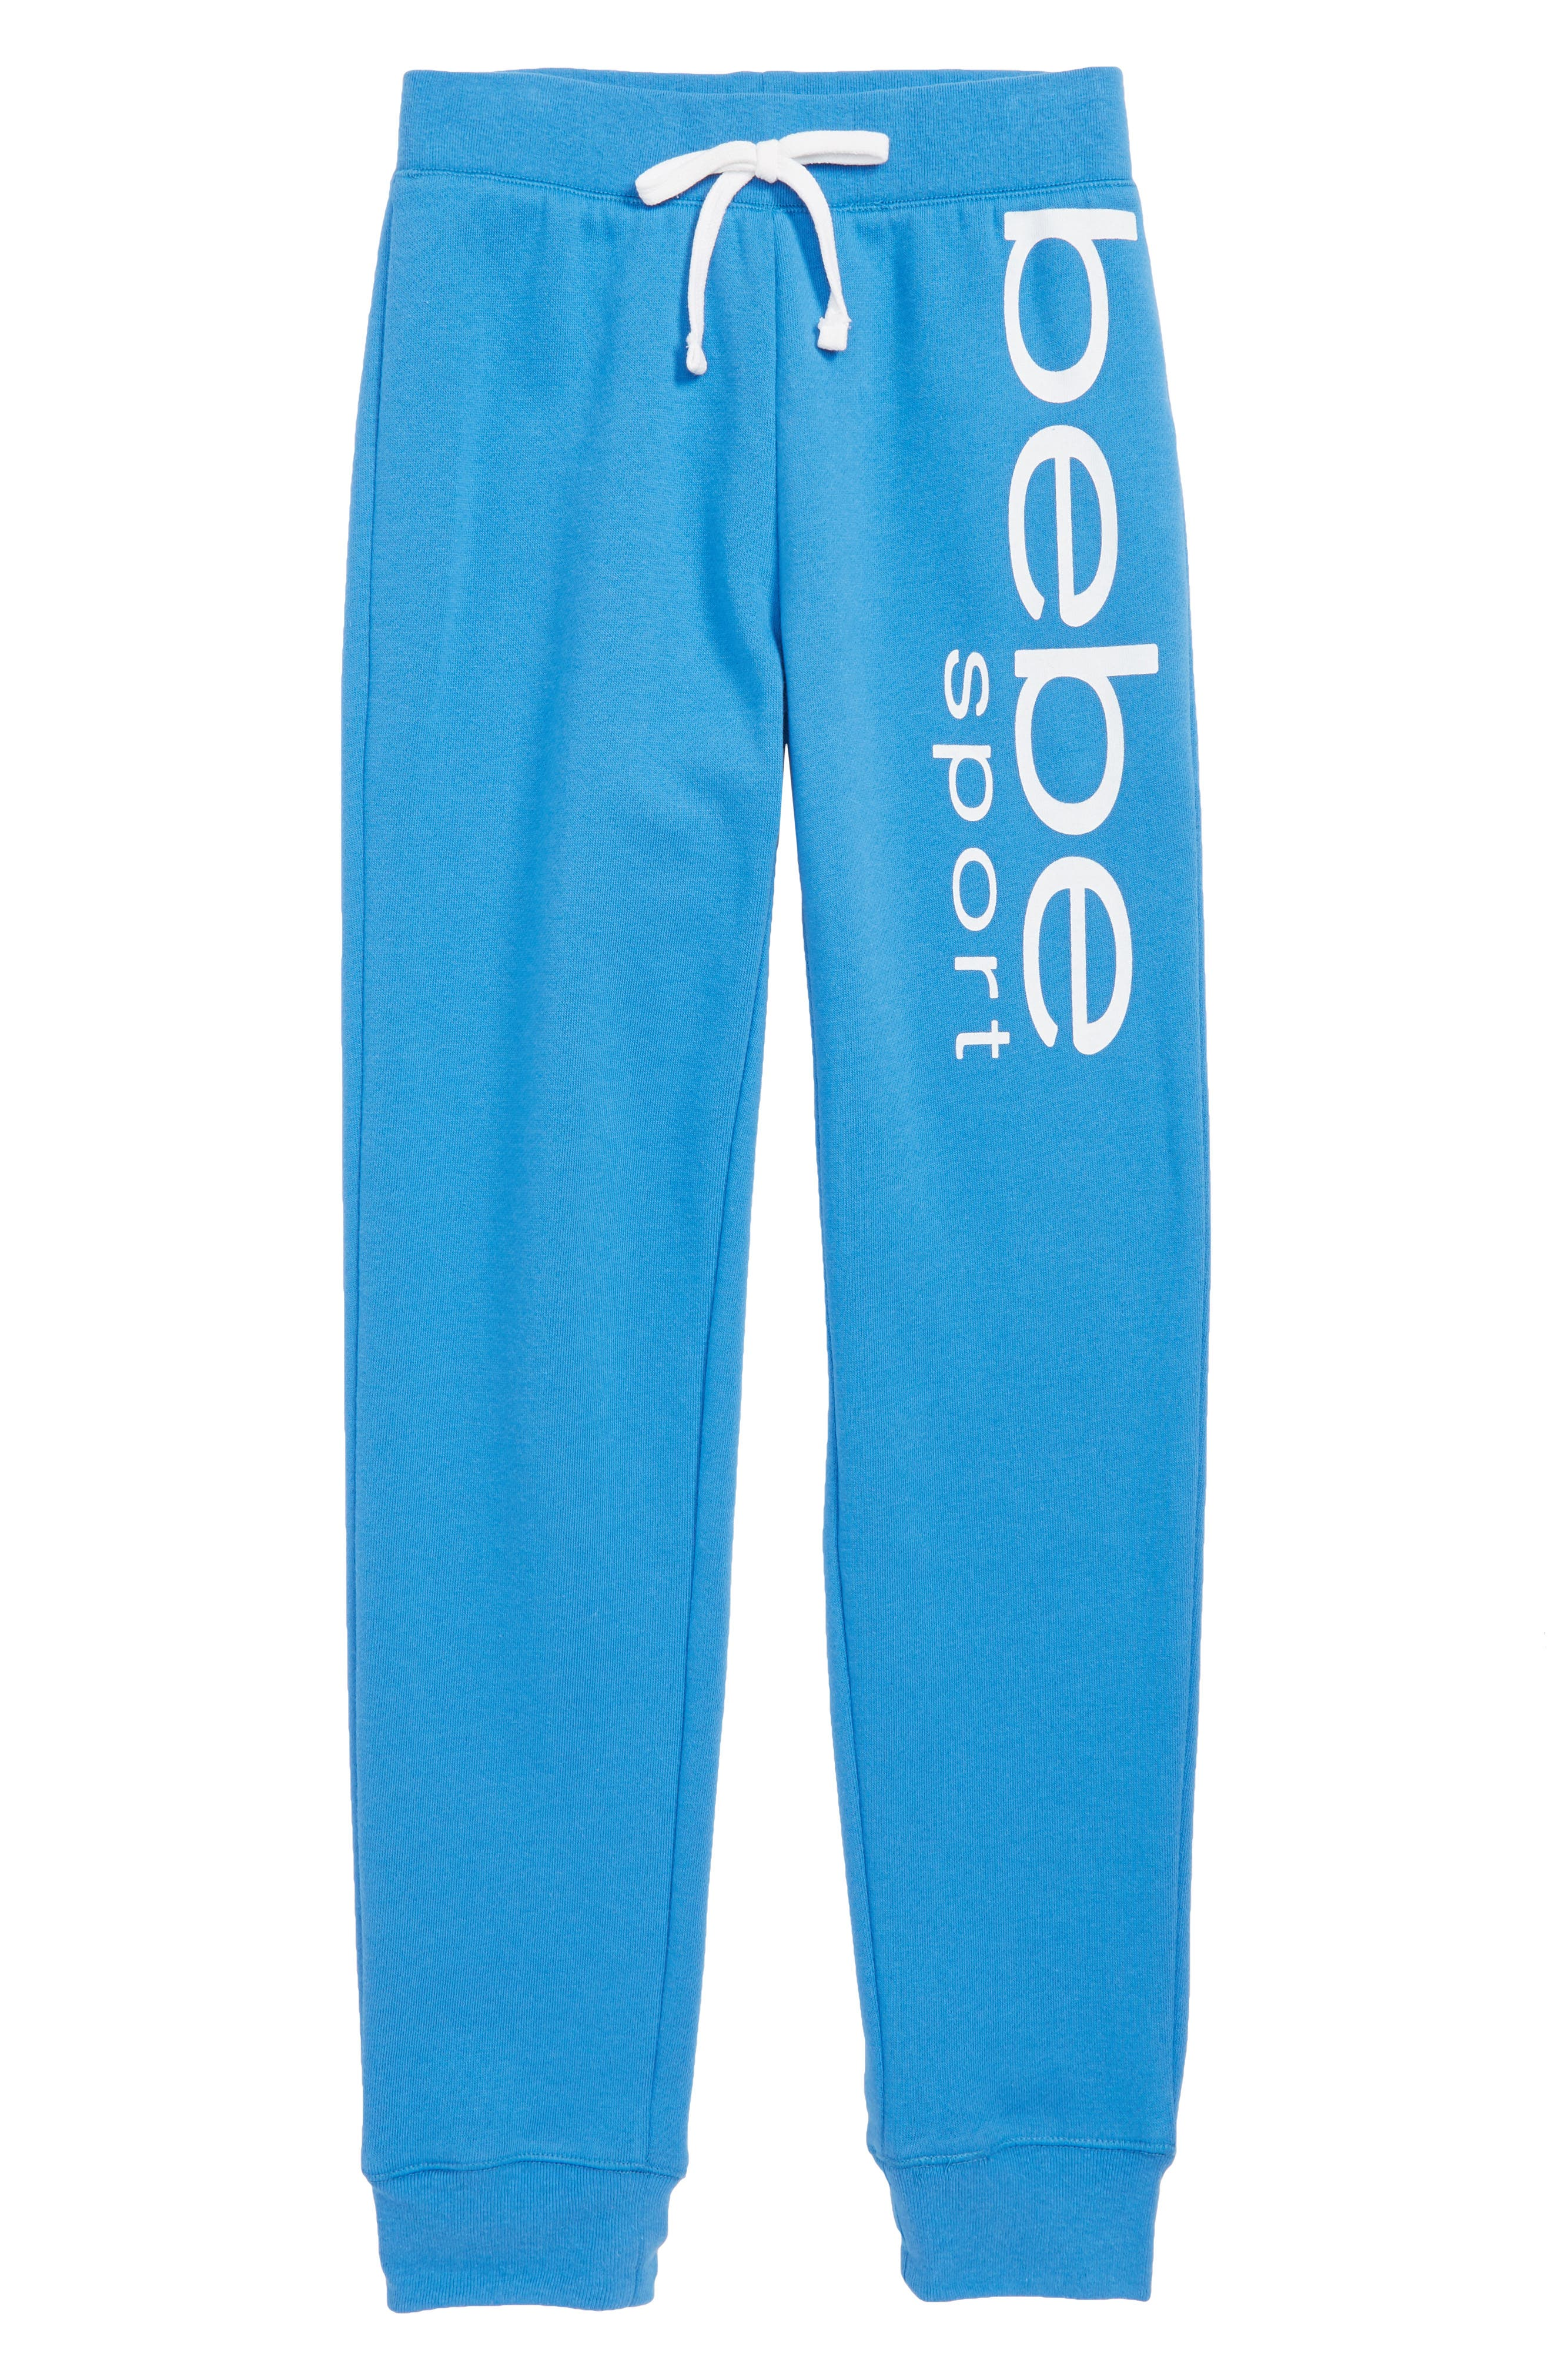 Active Jogger Pants,                         Main,                         color, 408